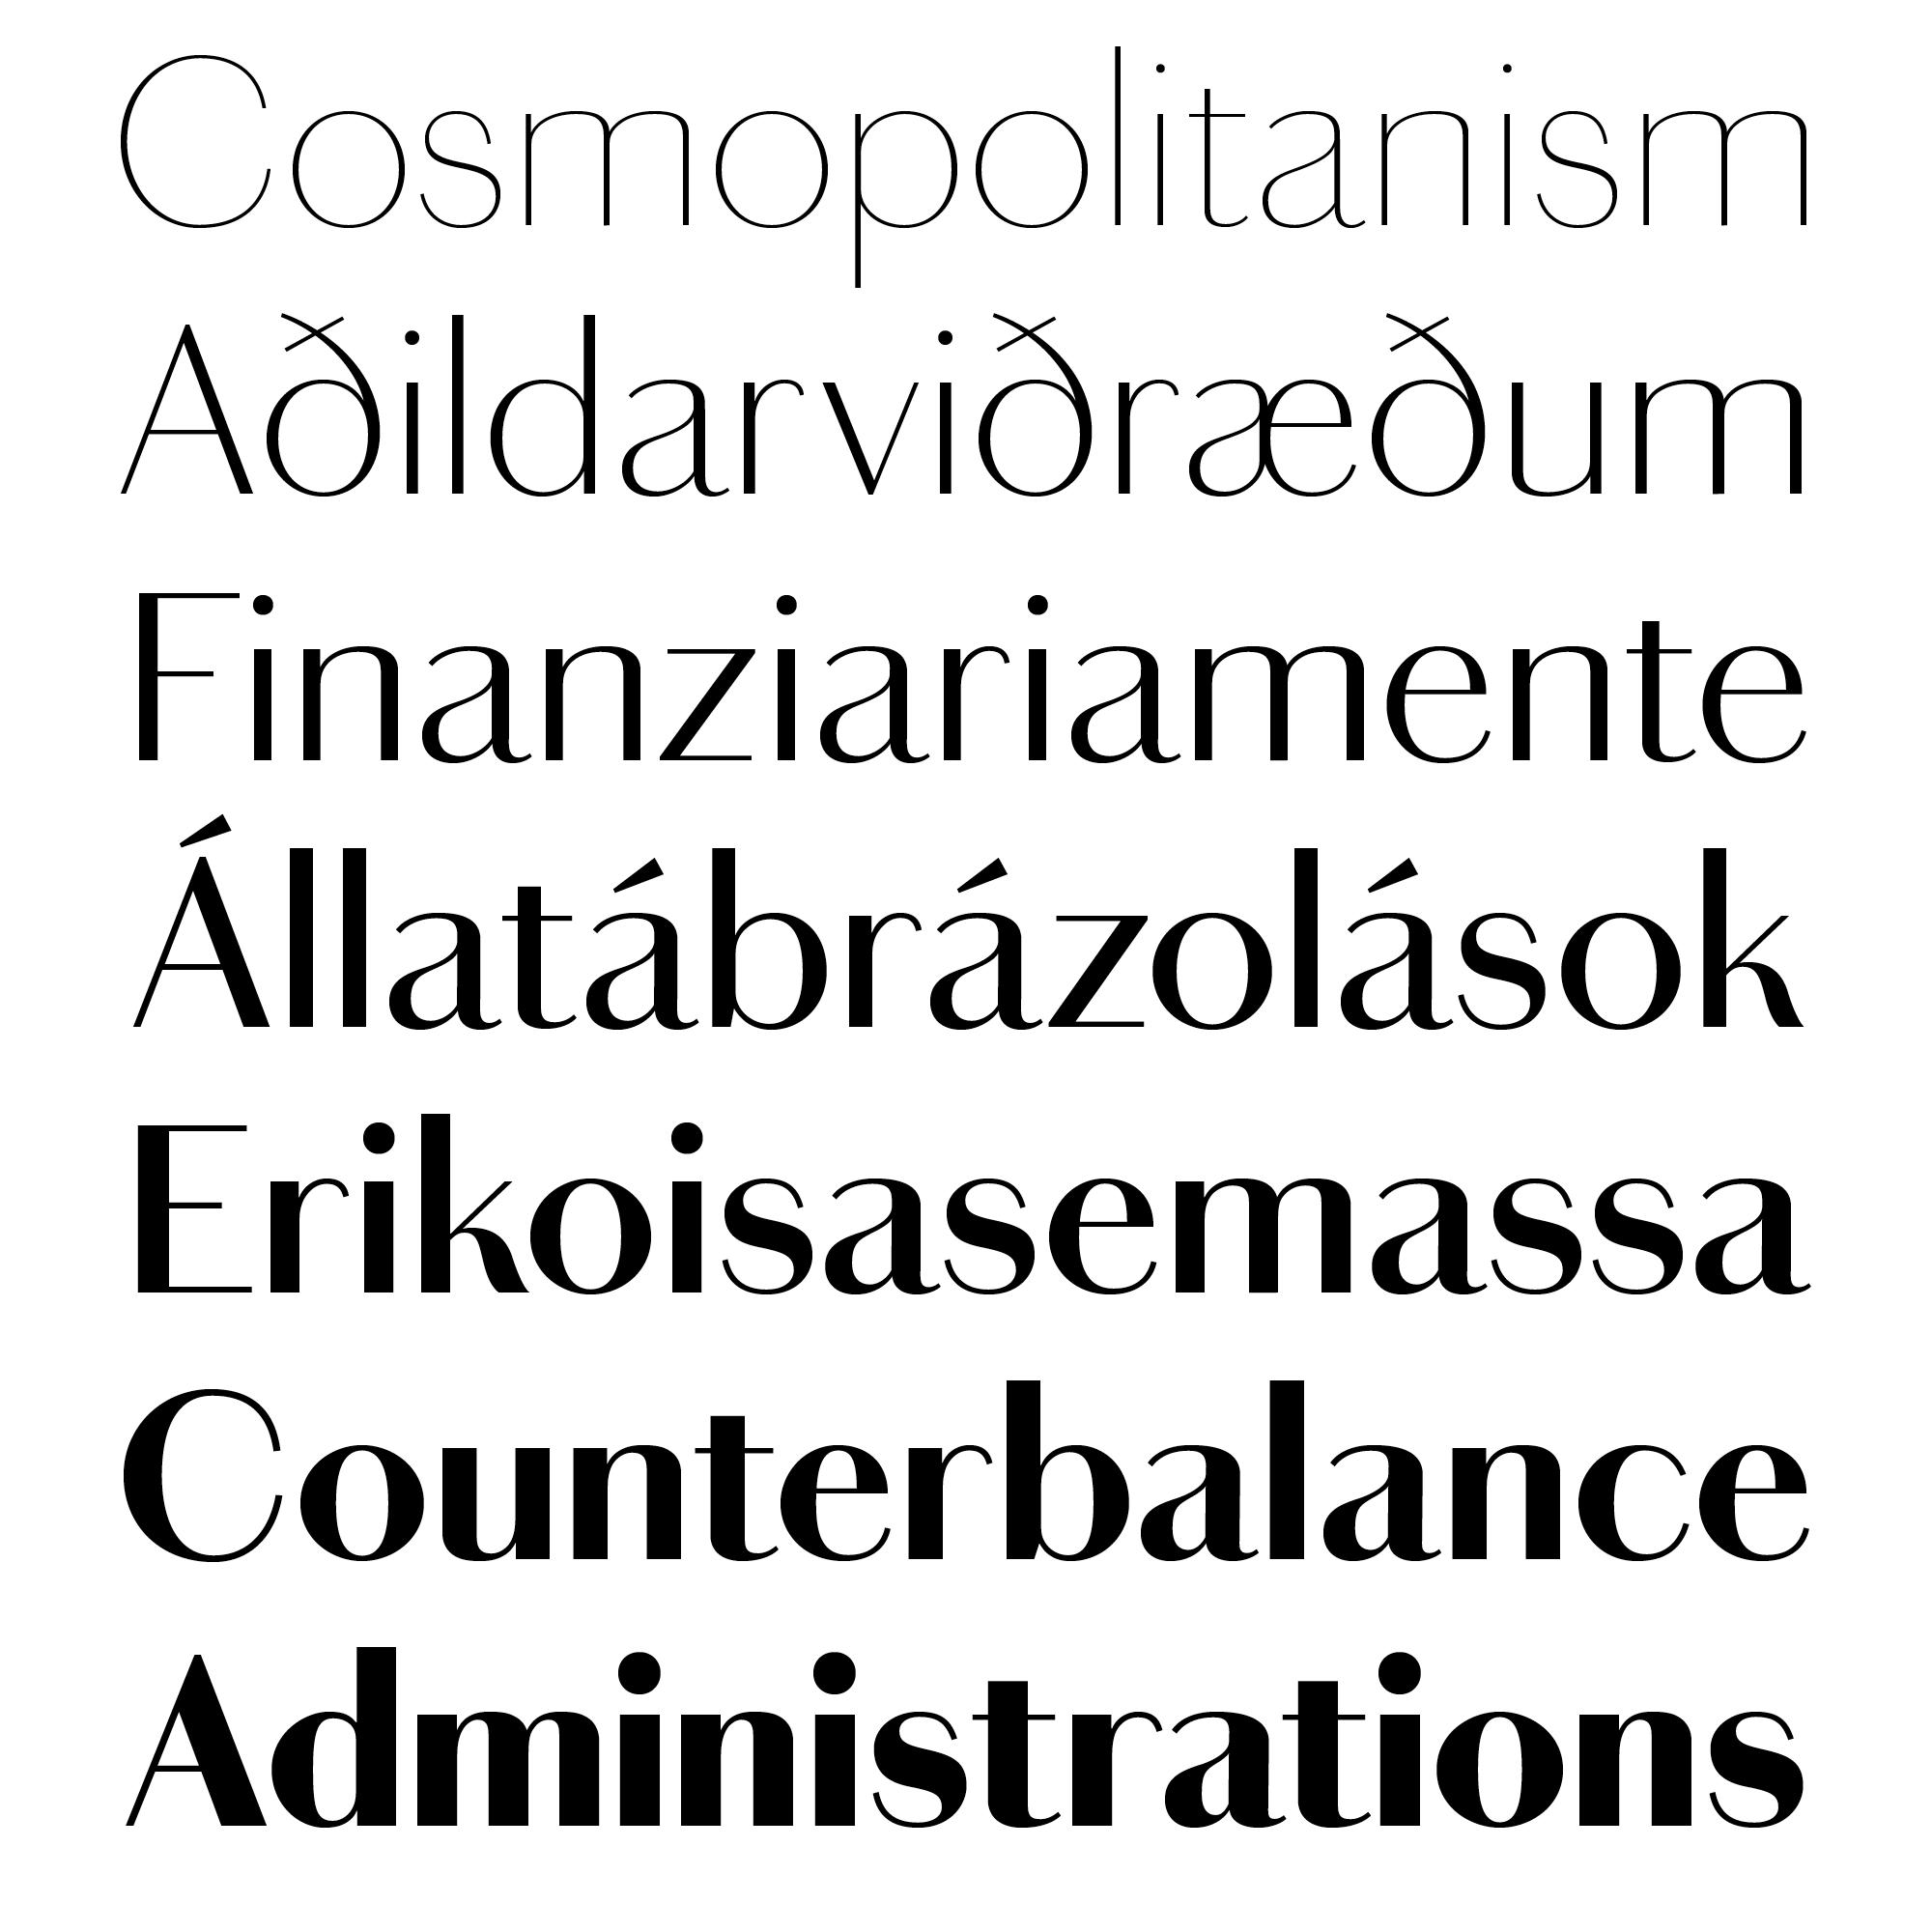 Chiswick – Typographica